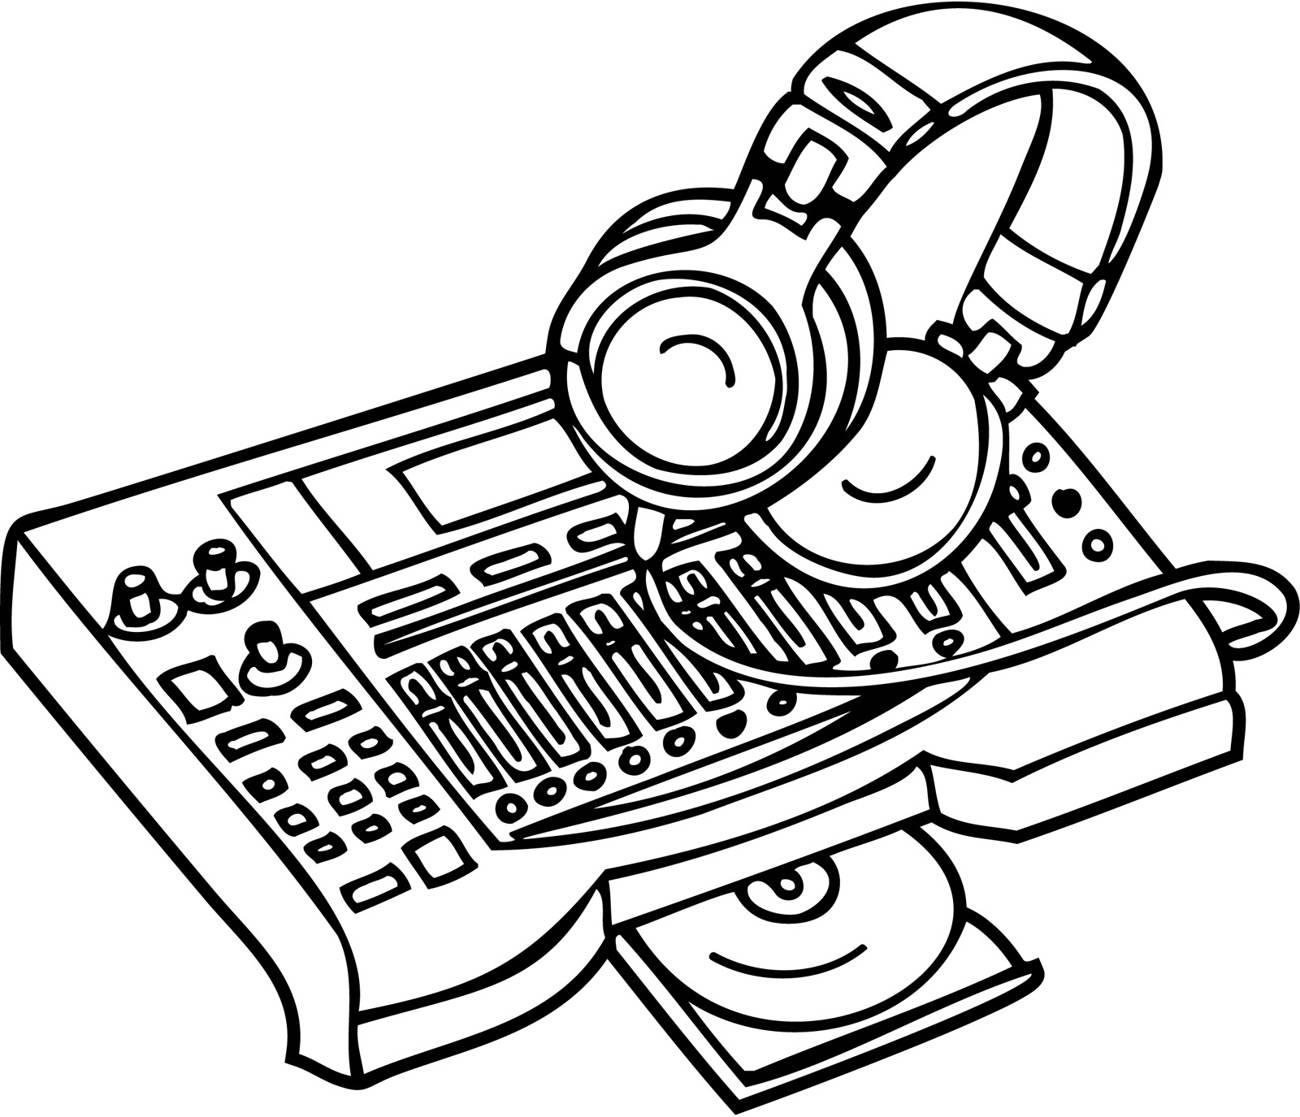 MUSIC-093